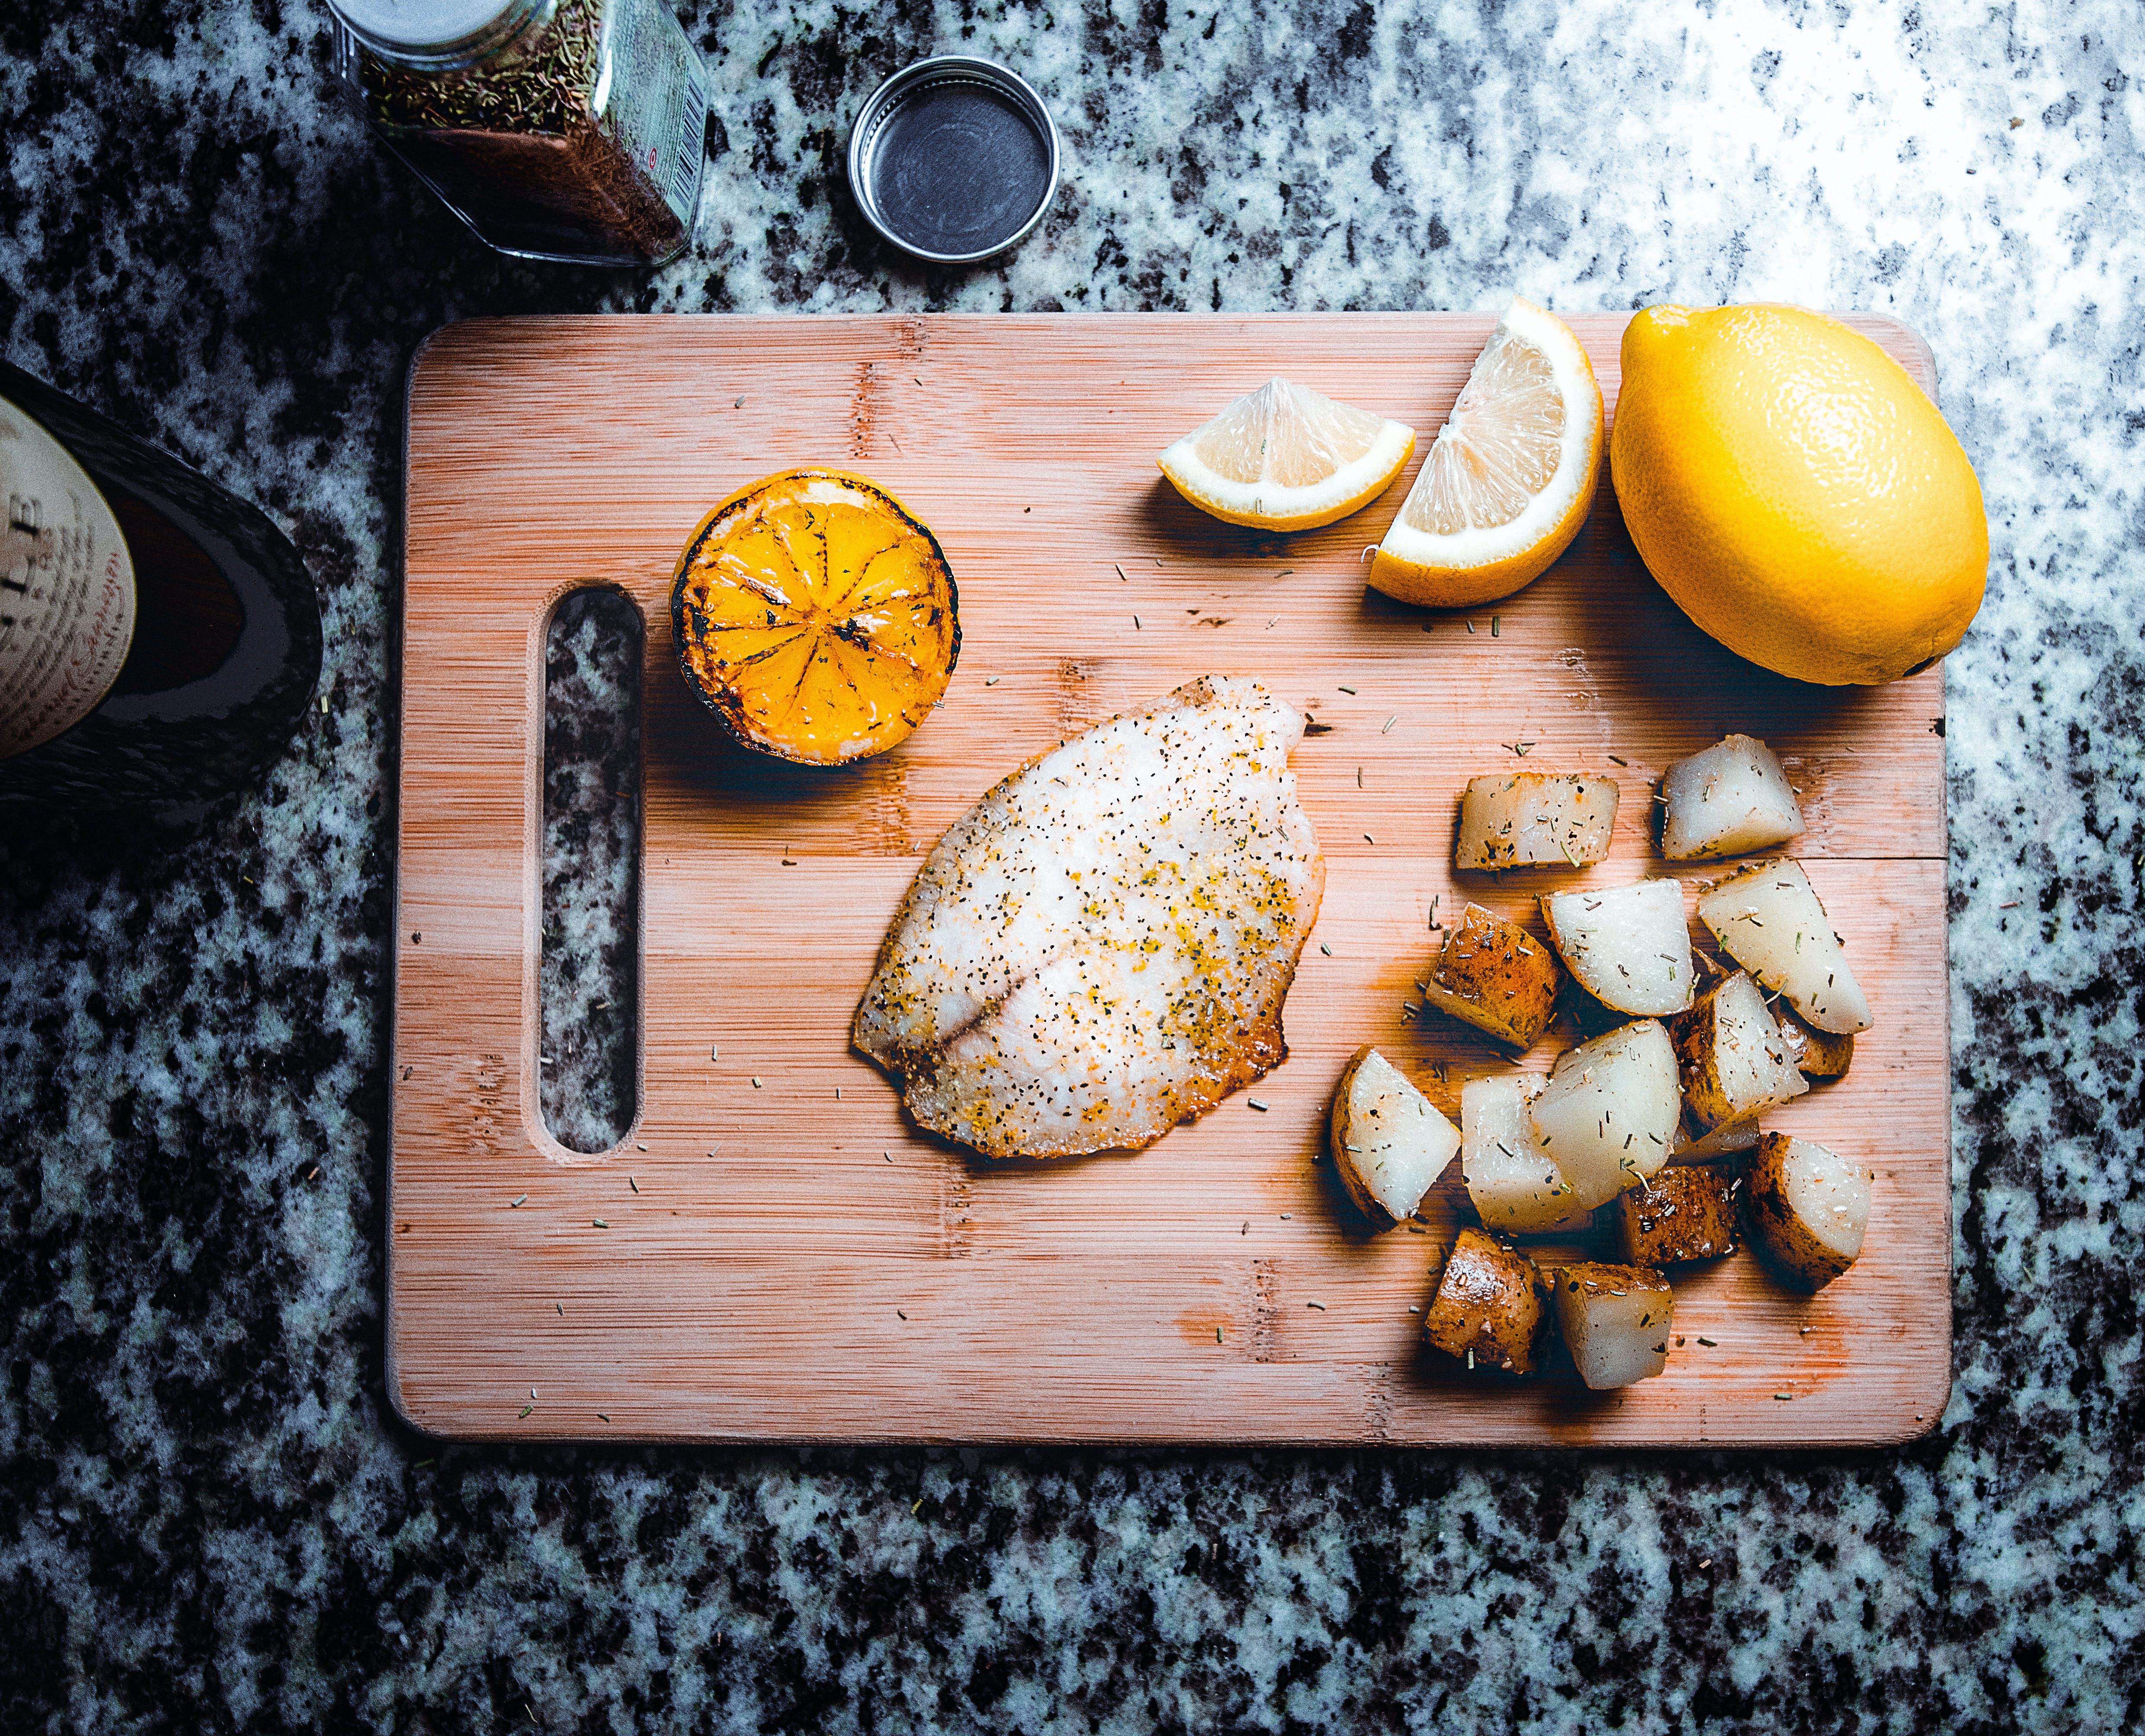 Sliced Lemon on Board